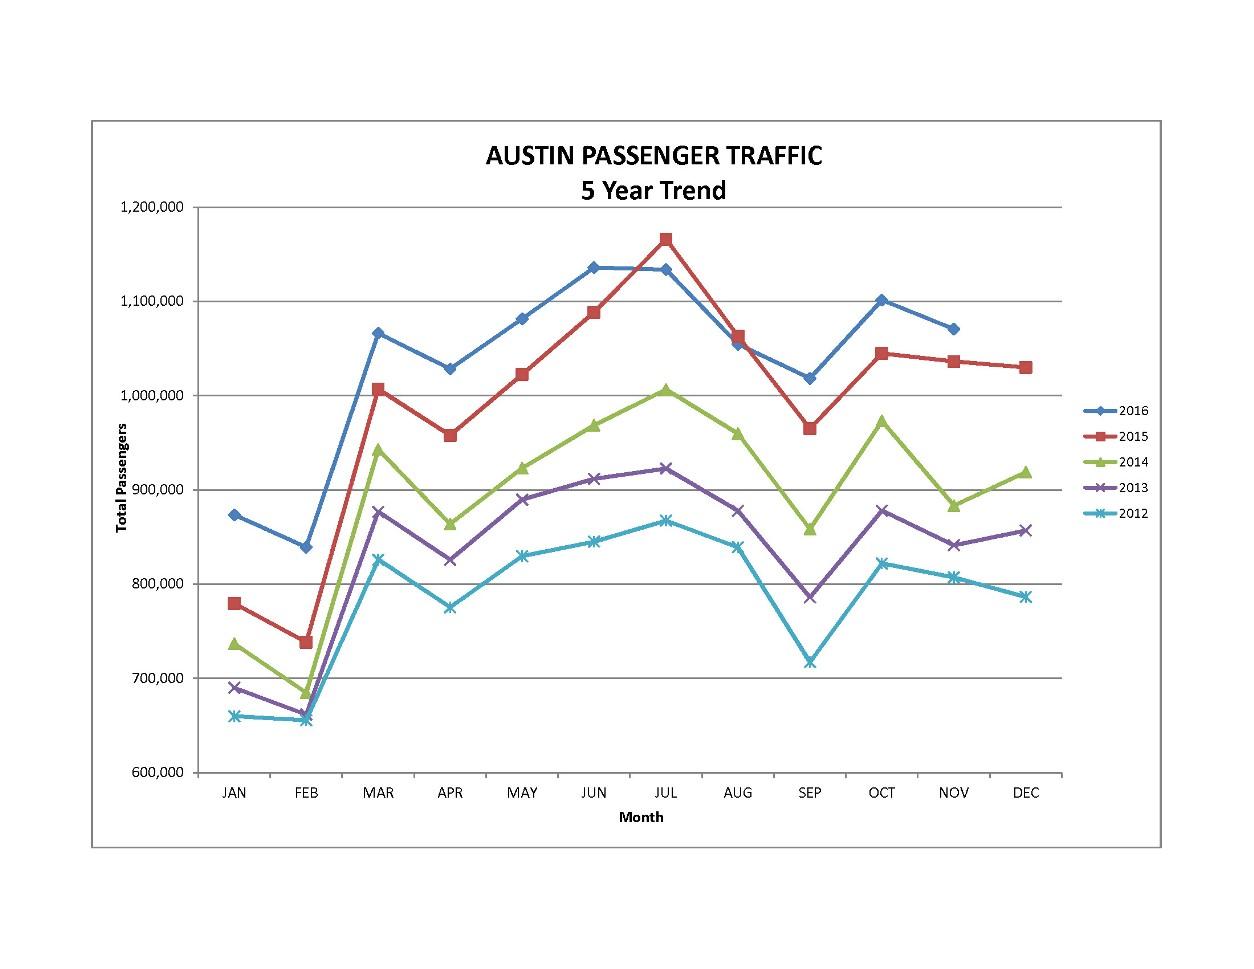 November 5-year trend graph